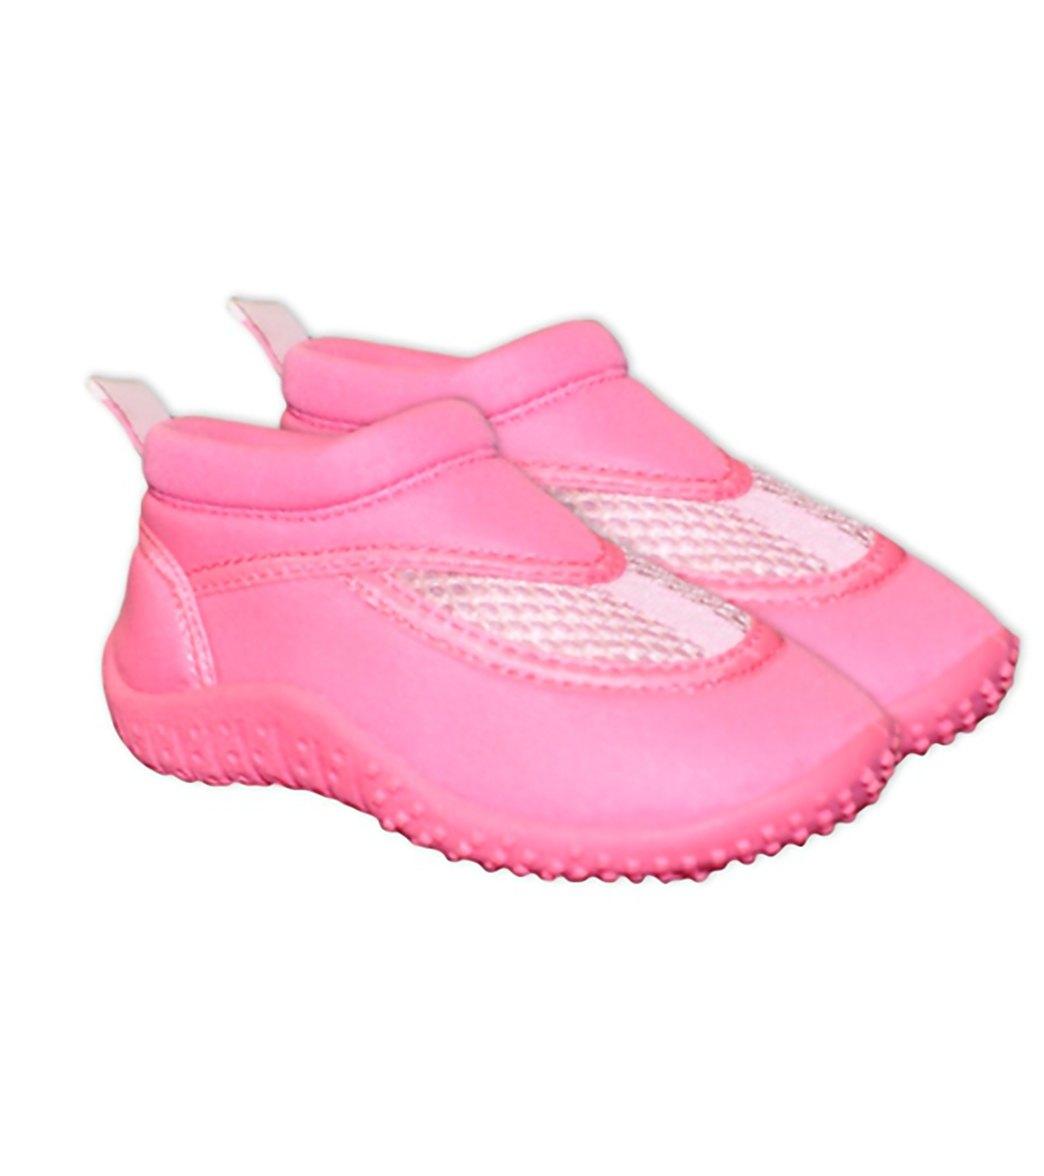 dd5b2b6adb4e iPlay Kid s Swim Shoes at SwimOutlet.com